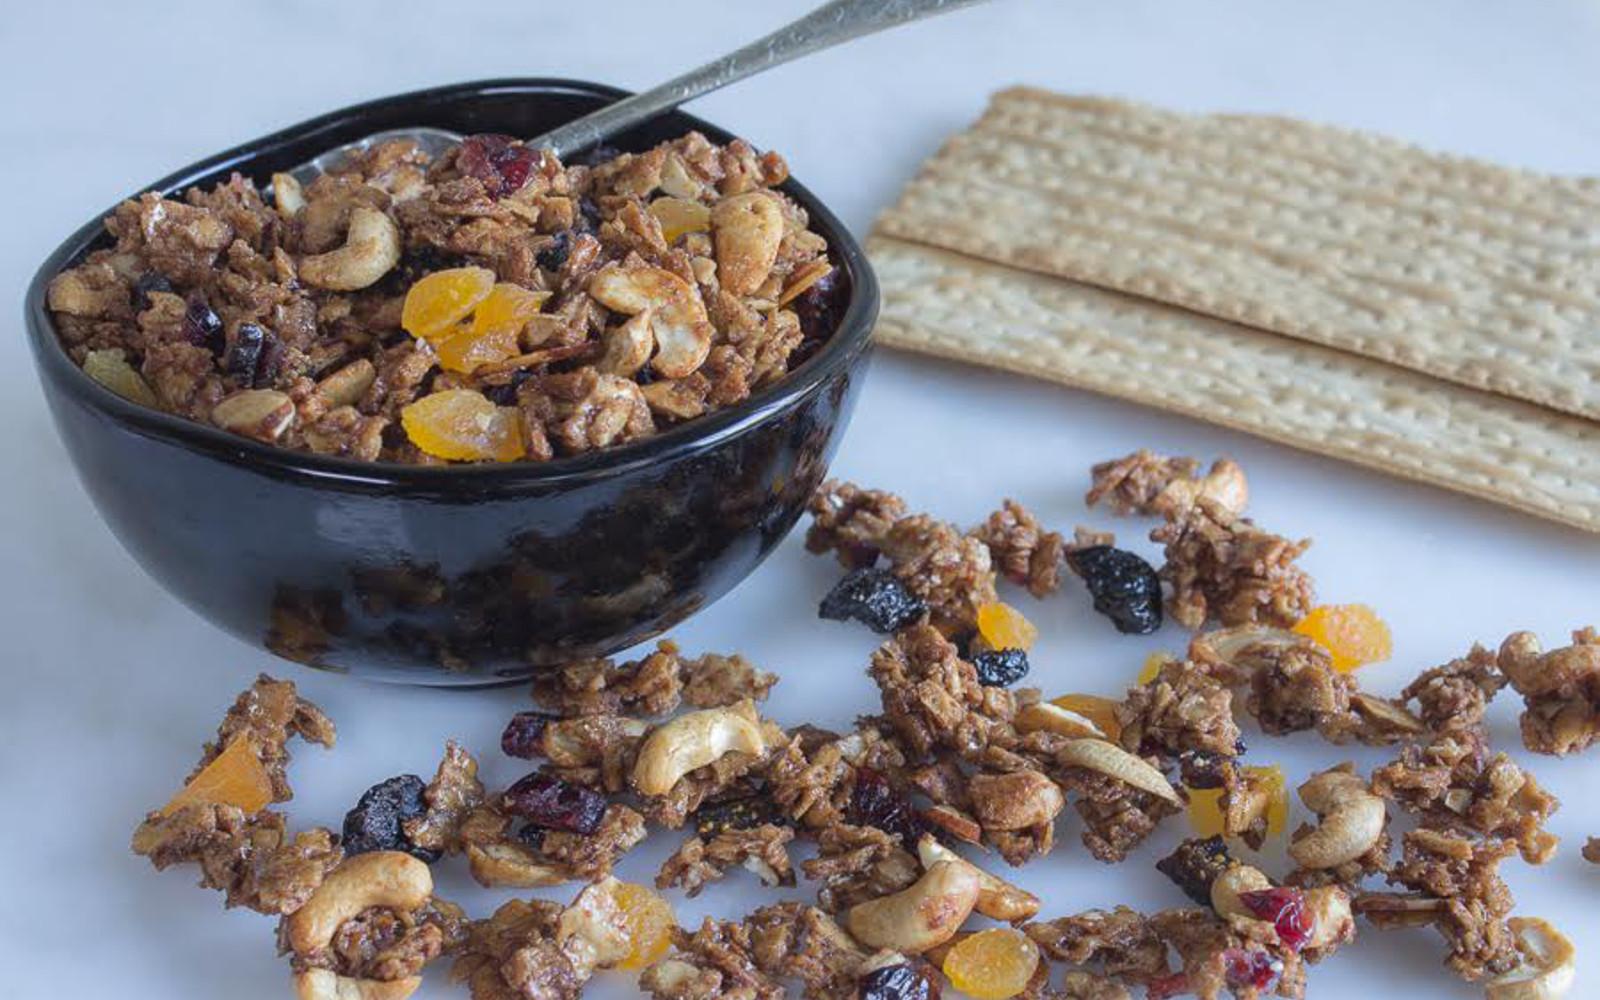 Matzo Granola For Passover